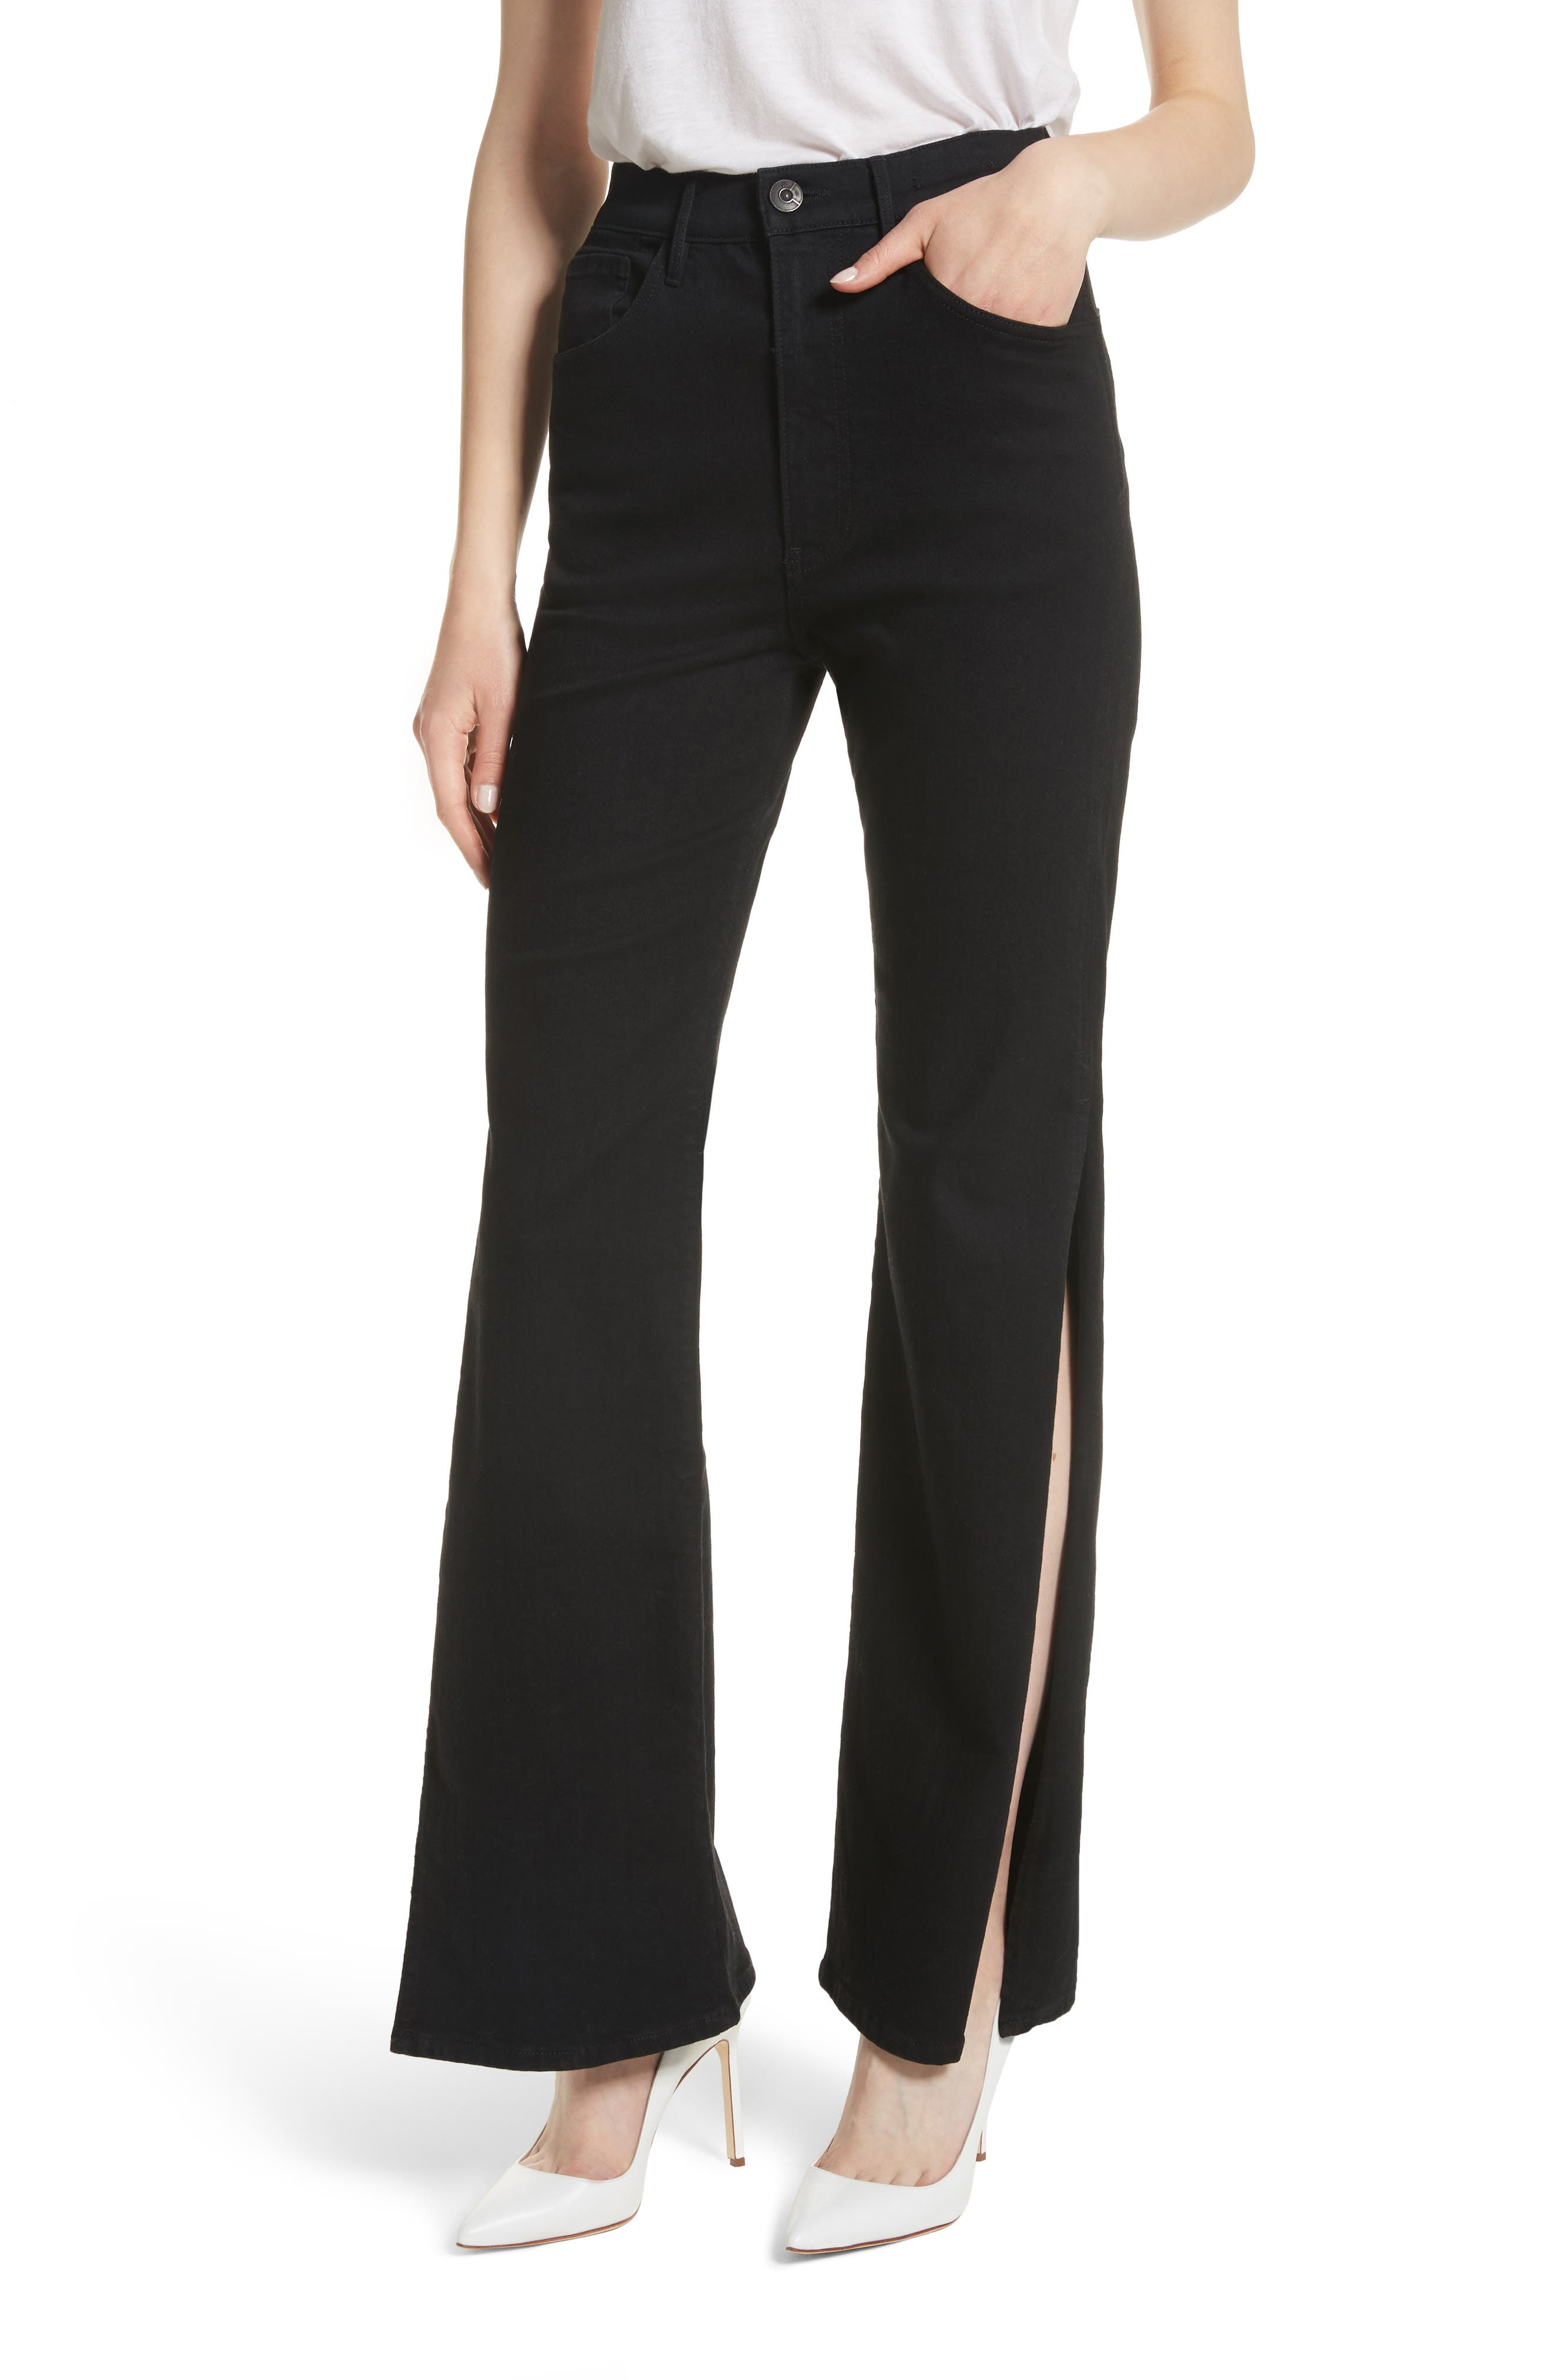 W4 Adeline High Waist Split Flare Jeans,                         Main,                         color, 001